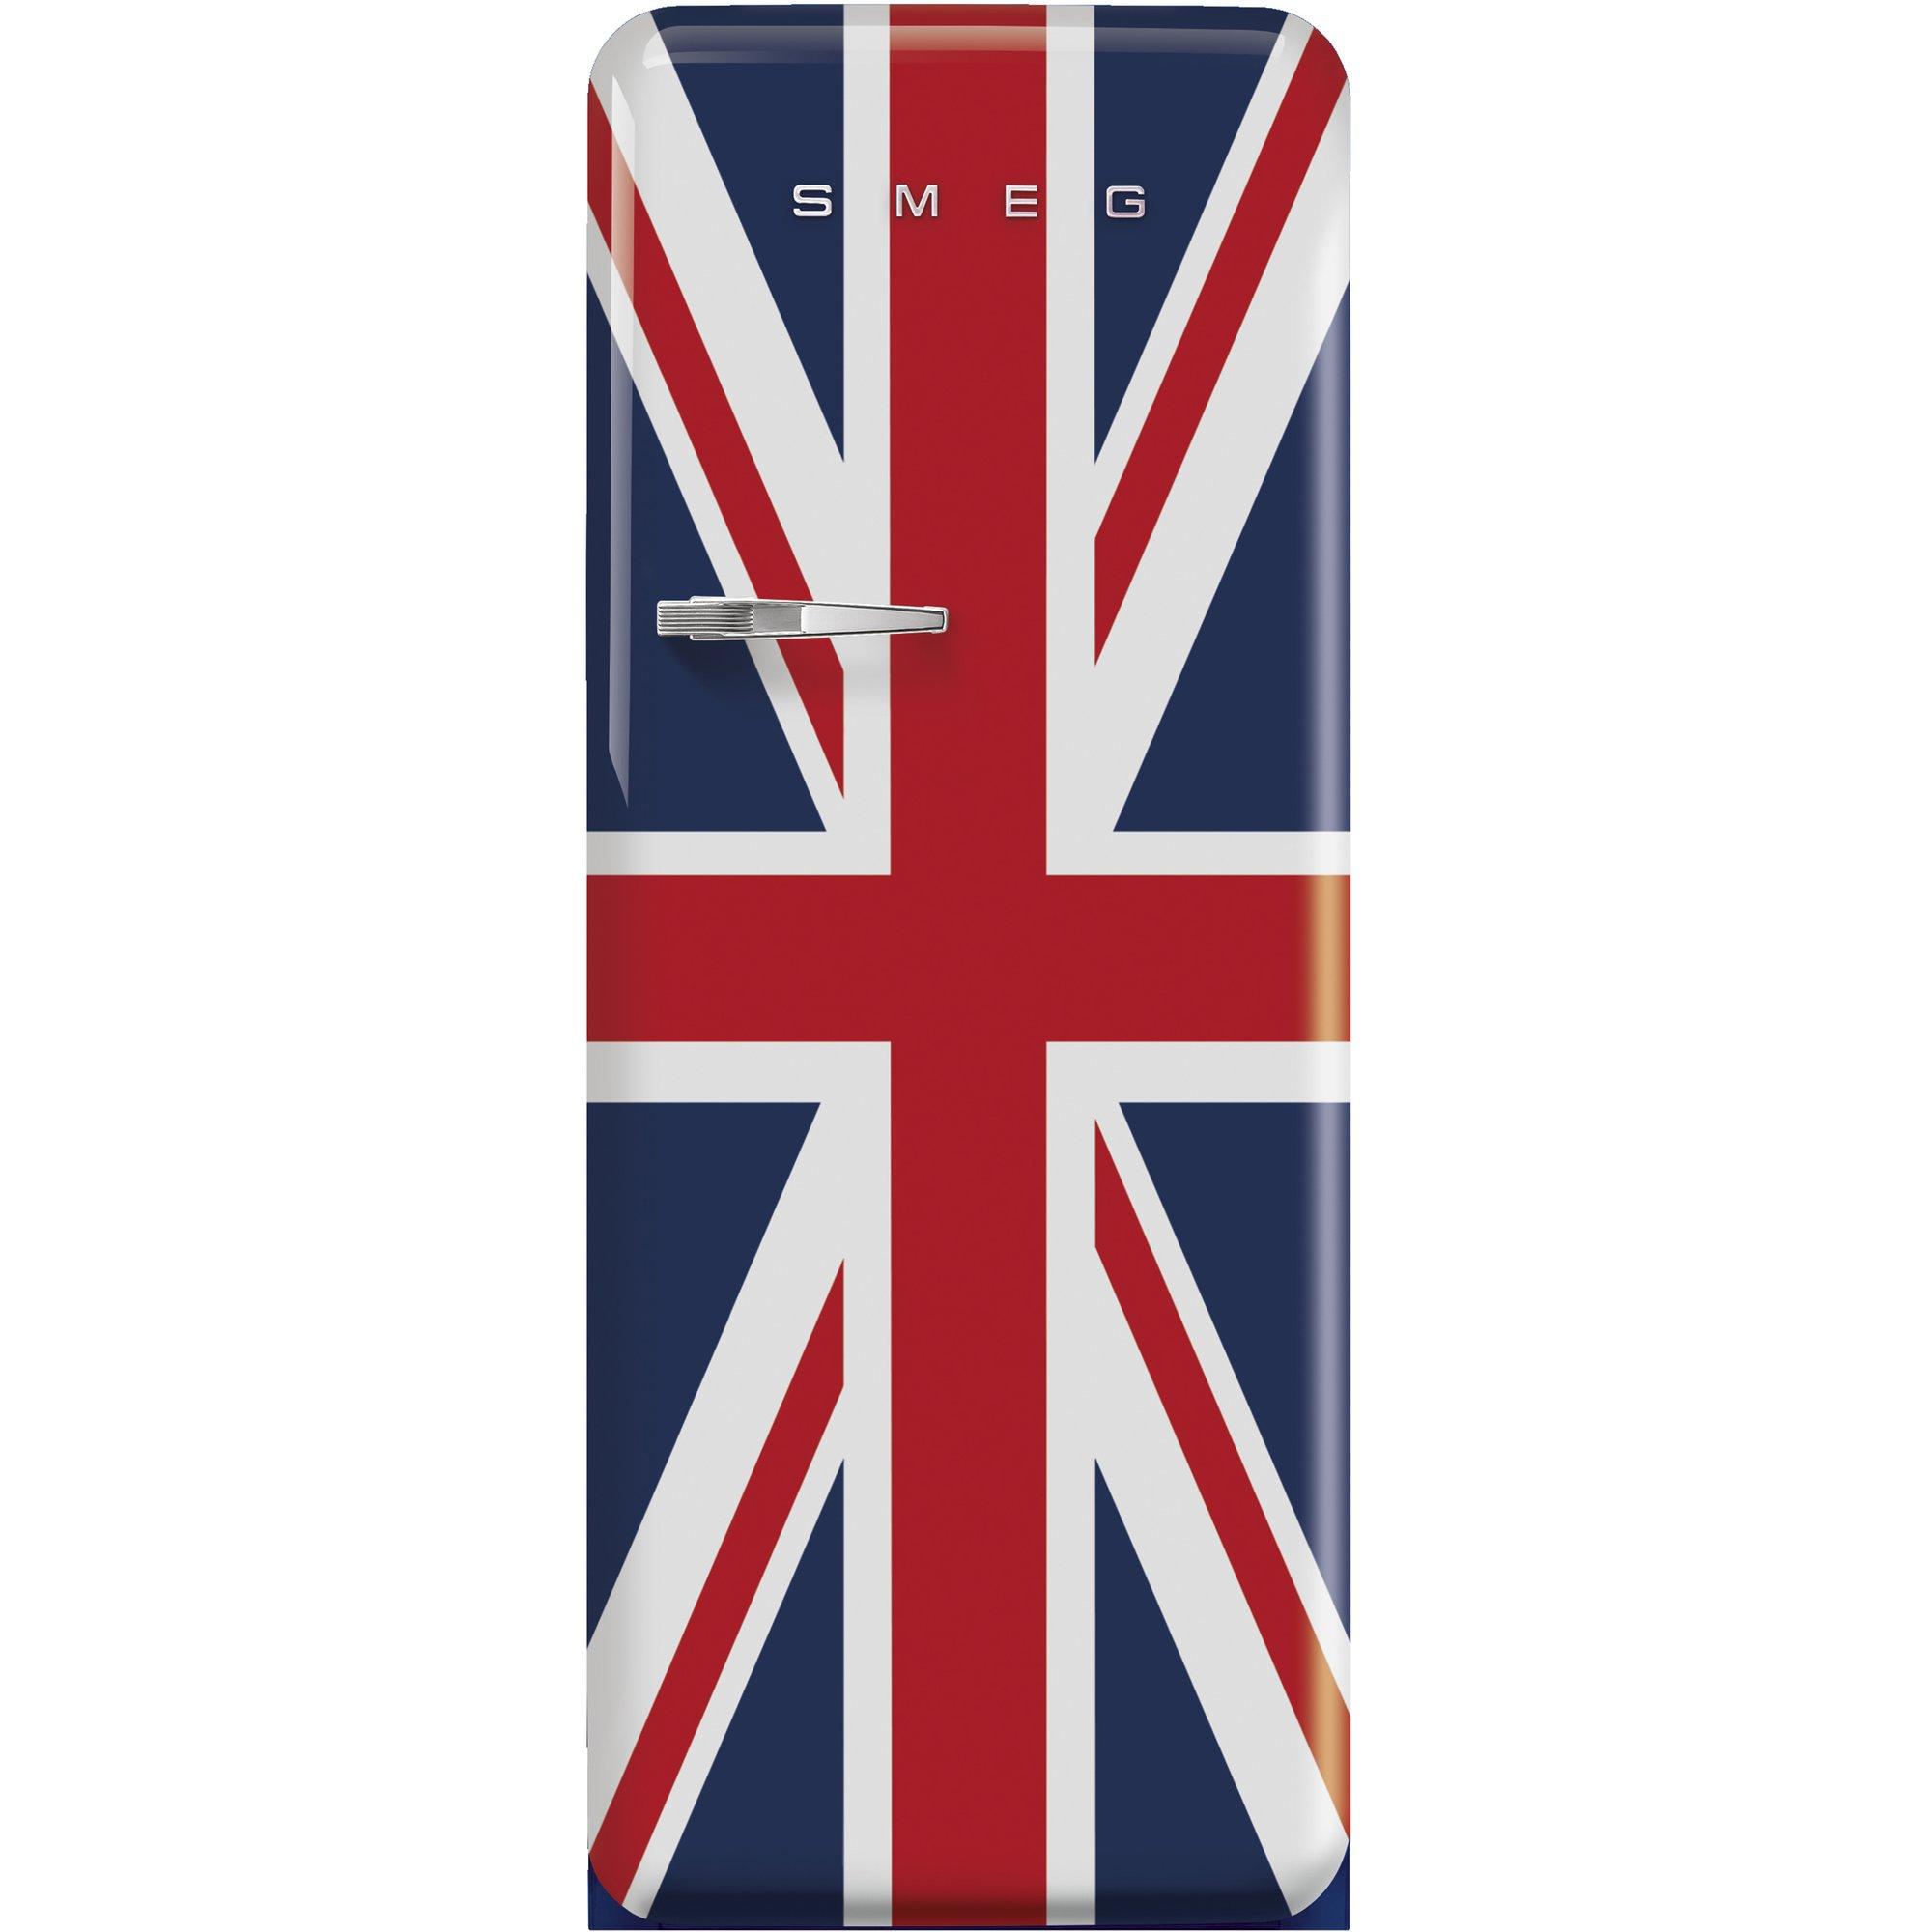 Smeg Kylskåp i 50-tals Retrostil Högerhängt Union Jack